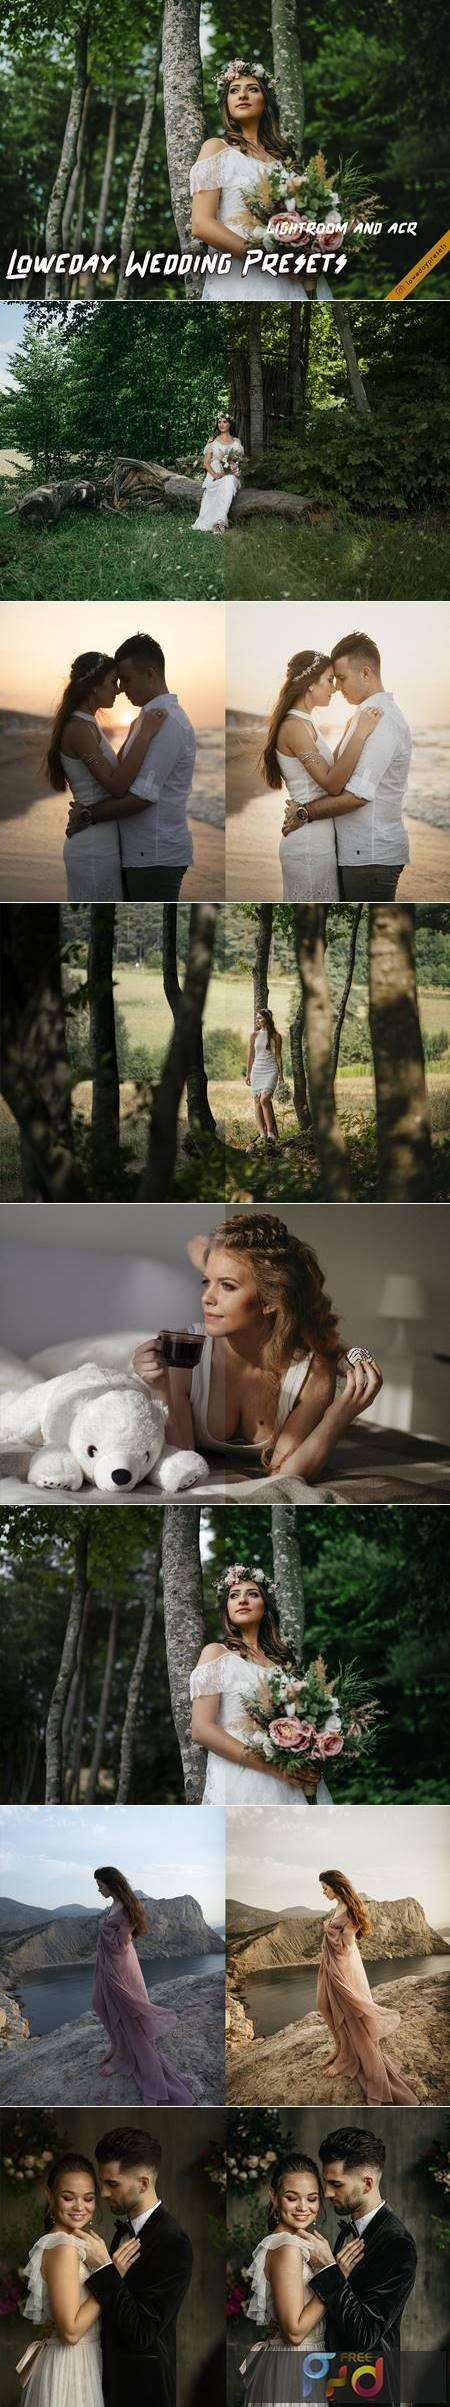 Loweday Wedding Presets - LR and ACR 4775119 1